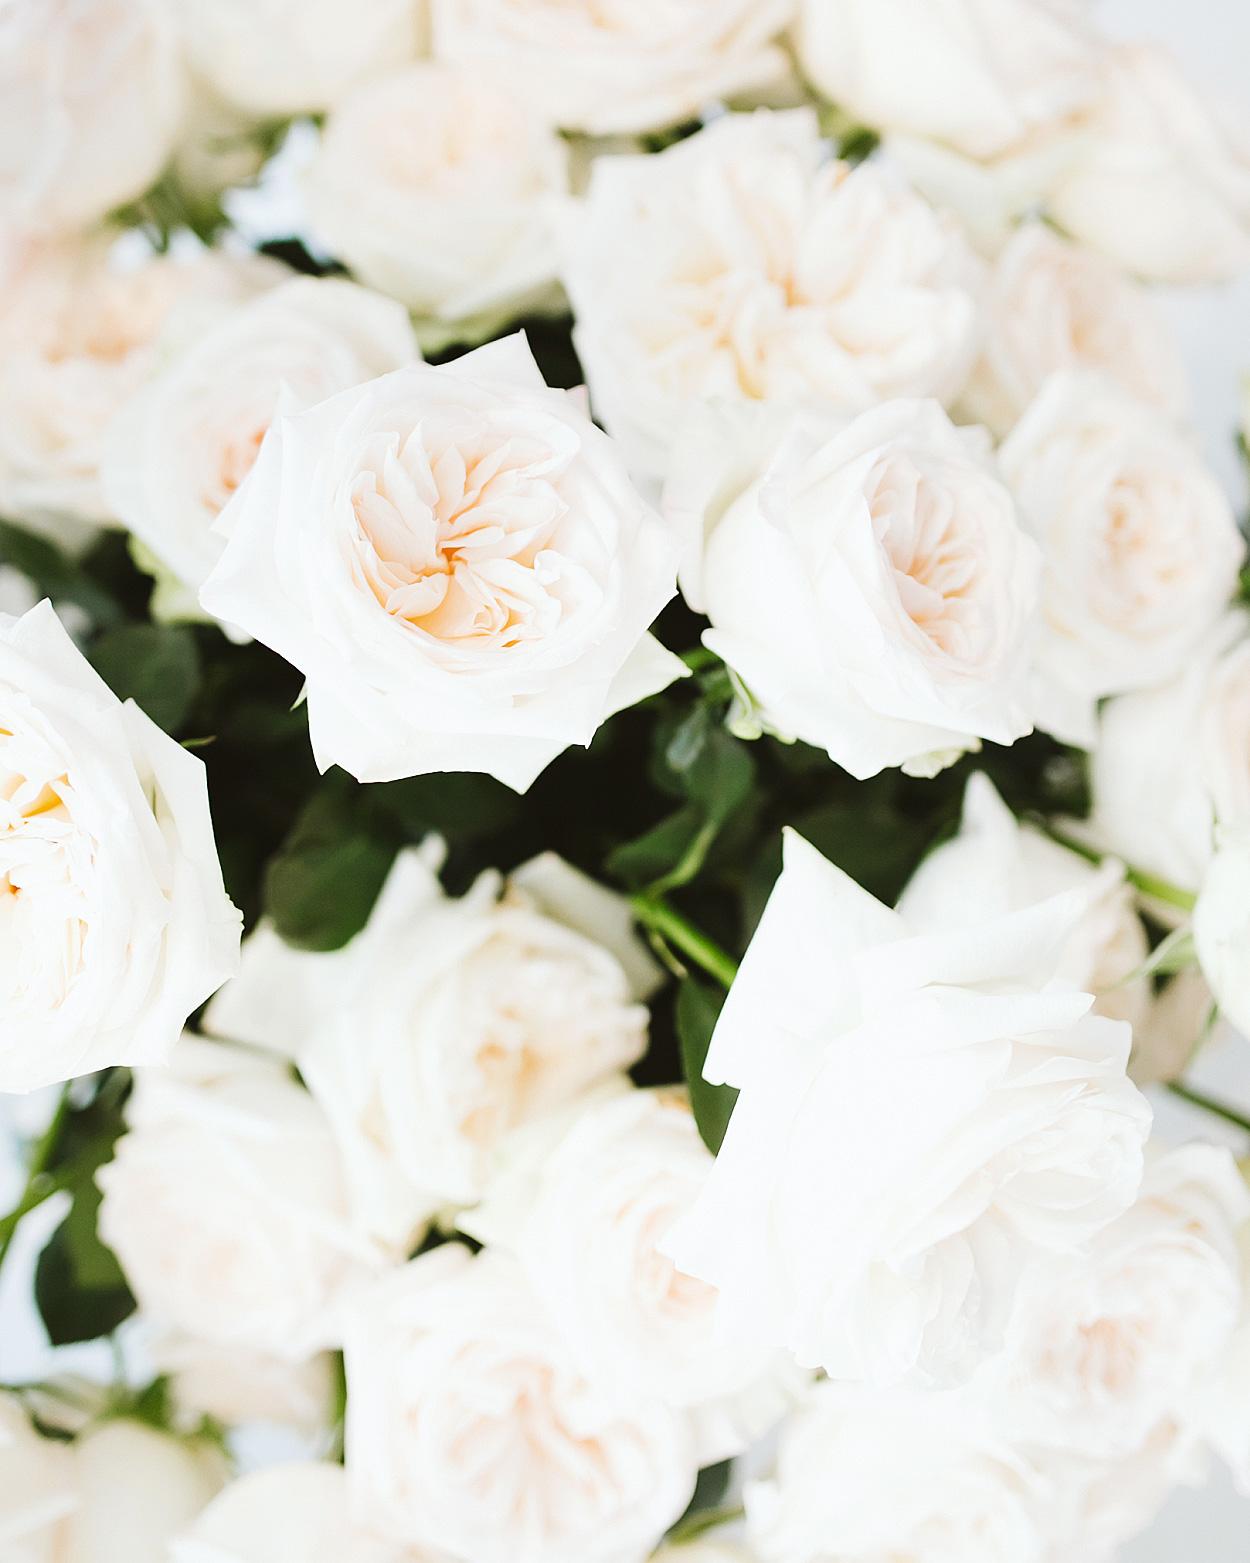 romantic-wedding-flowers-ohara-garden-rose-0516.jpg